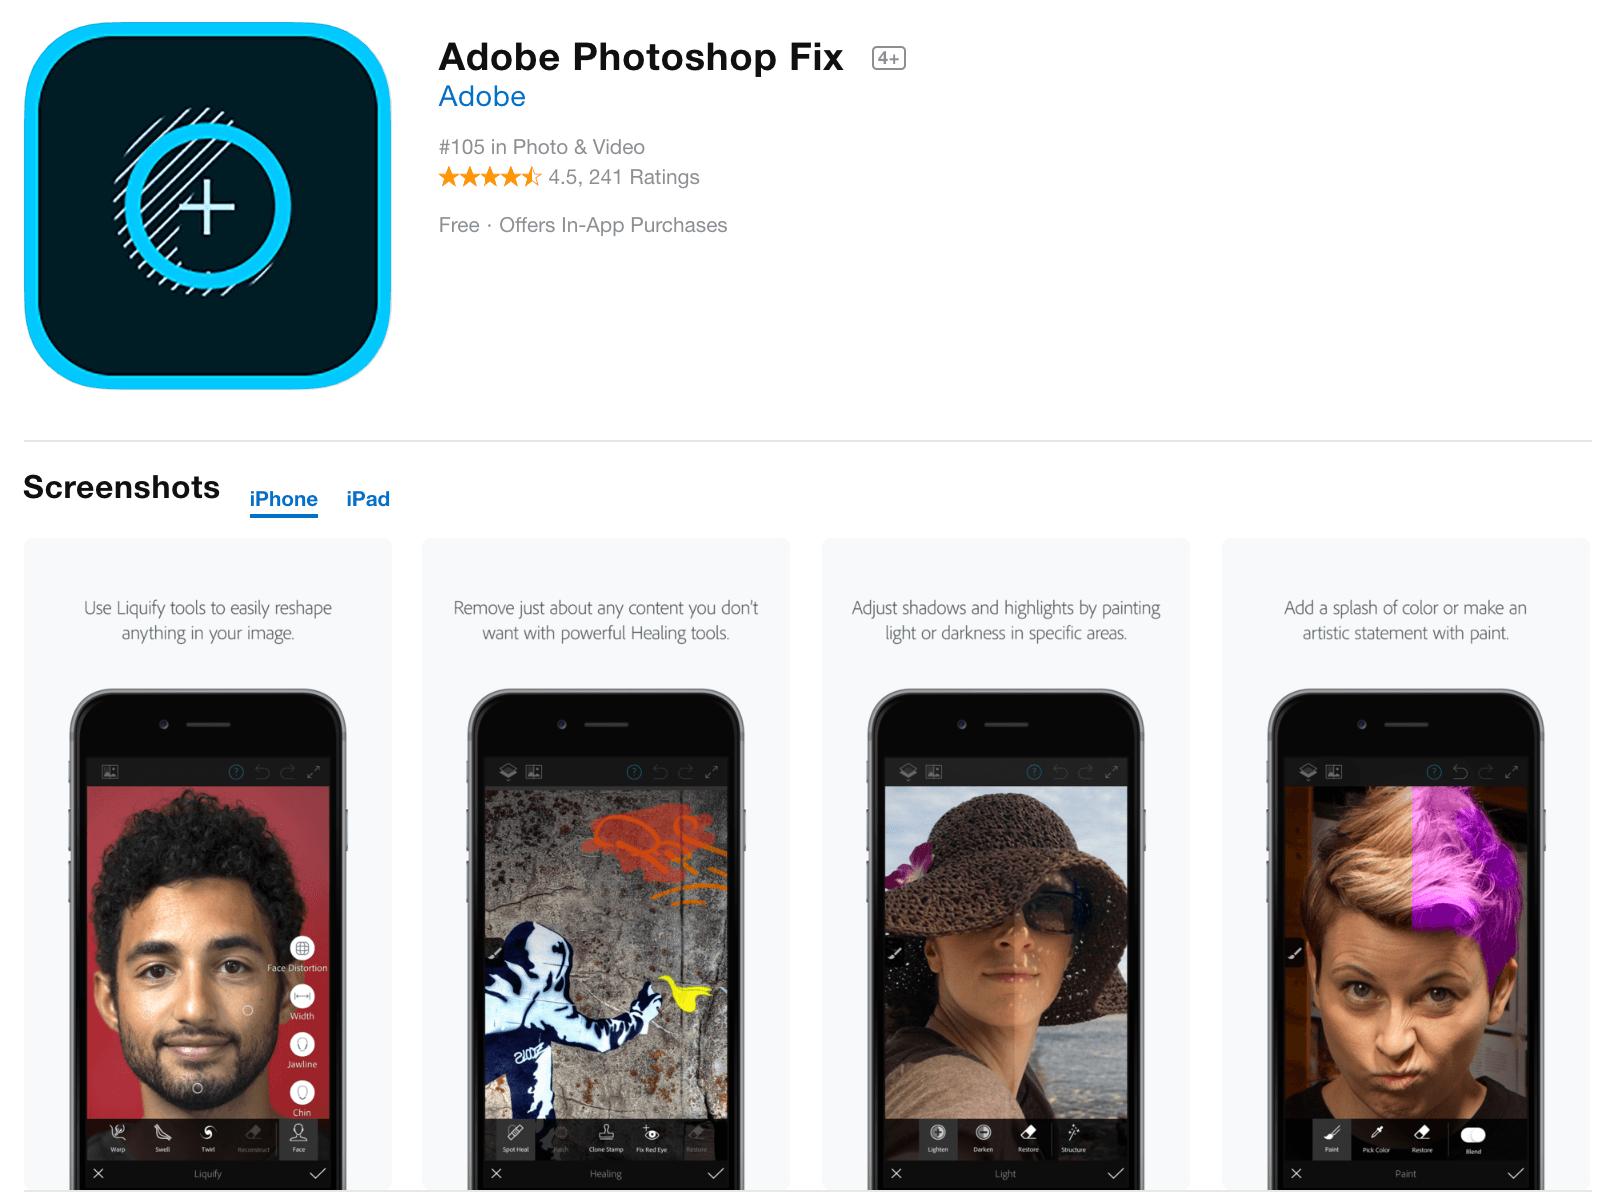 Adobe Photoshop Fix Photo Editor App